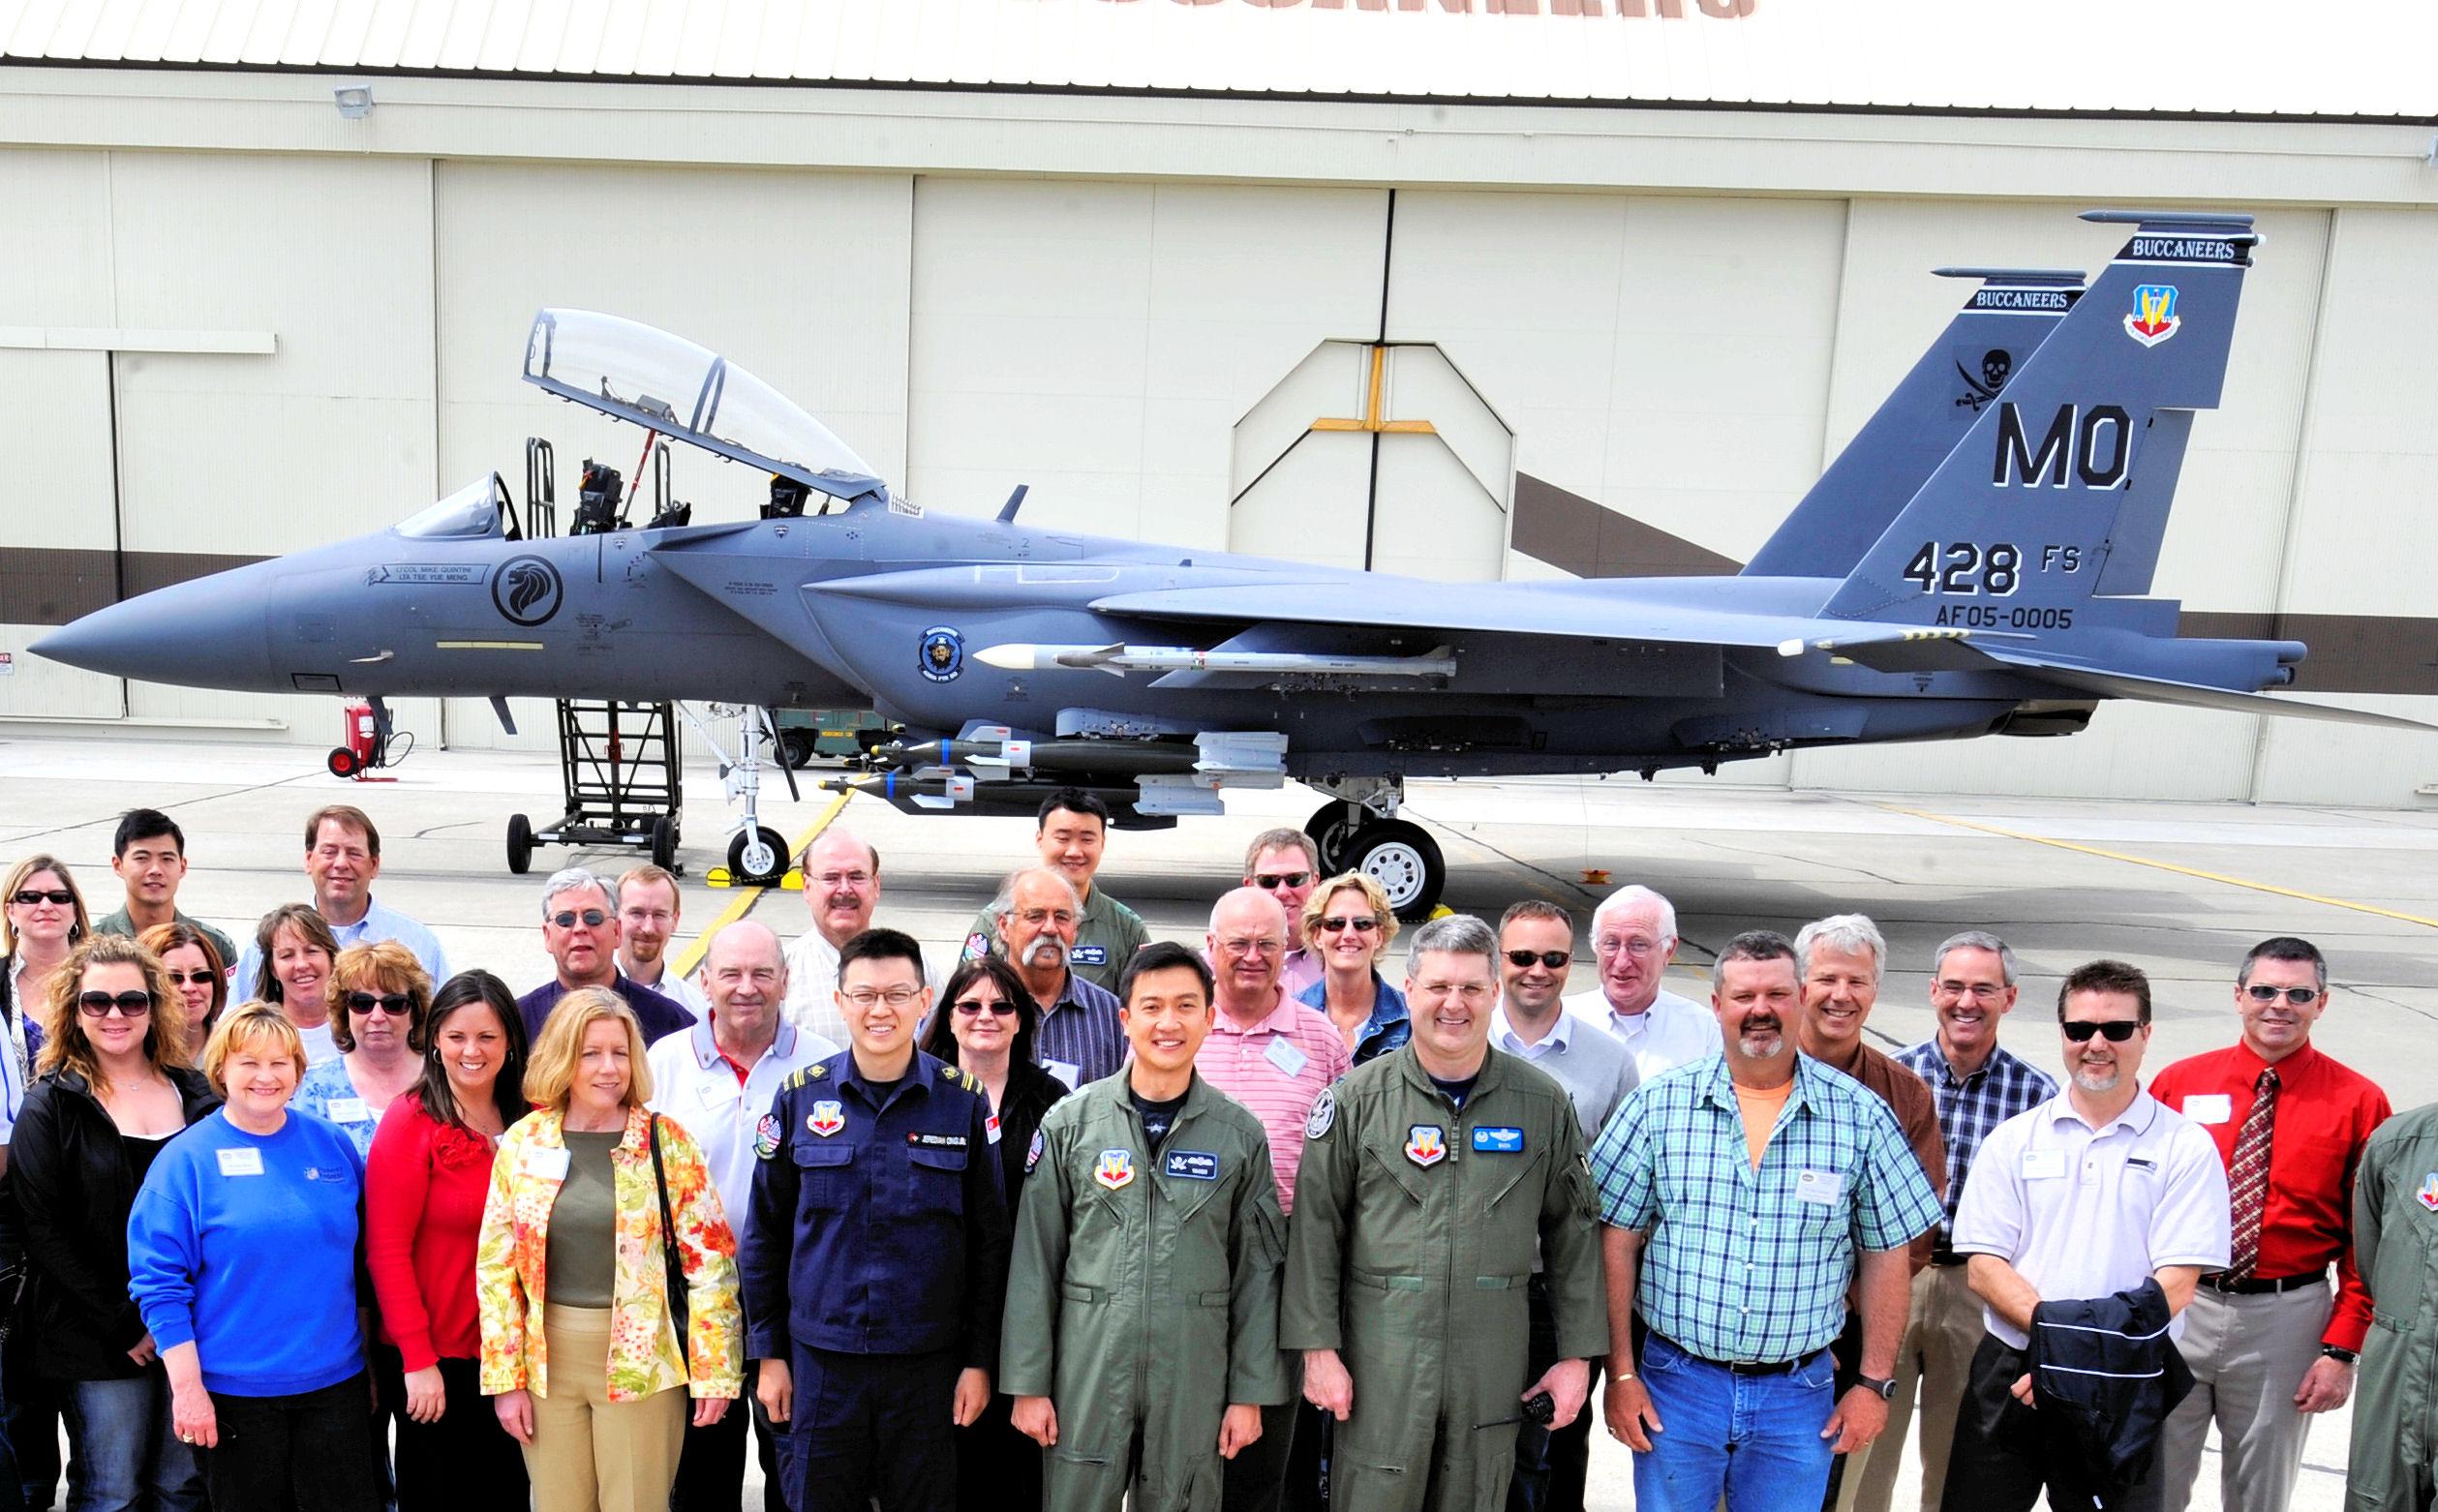 http://upload.wikimedia.org/wikipedia/commons/5/5e/428th_Fighter_Squadron_-_Boeing_F-15SG_Strike_Eagle_05-0005.jpg